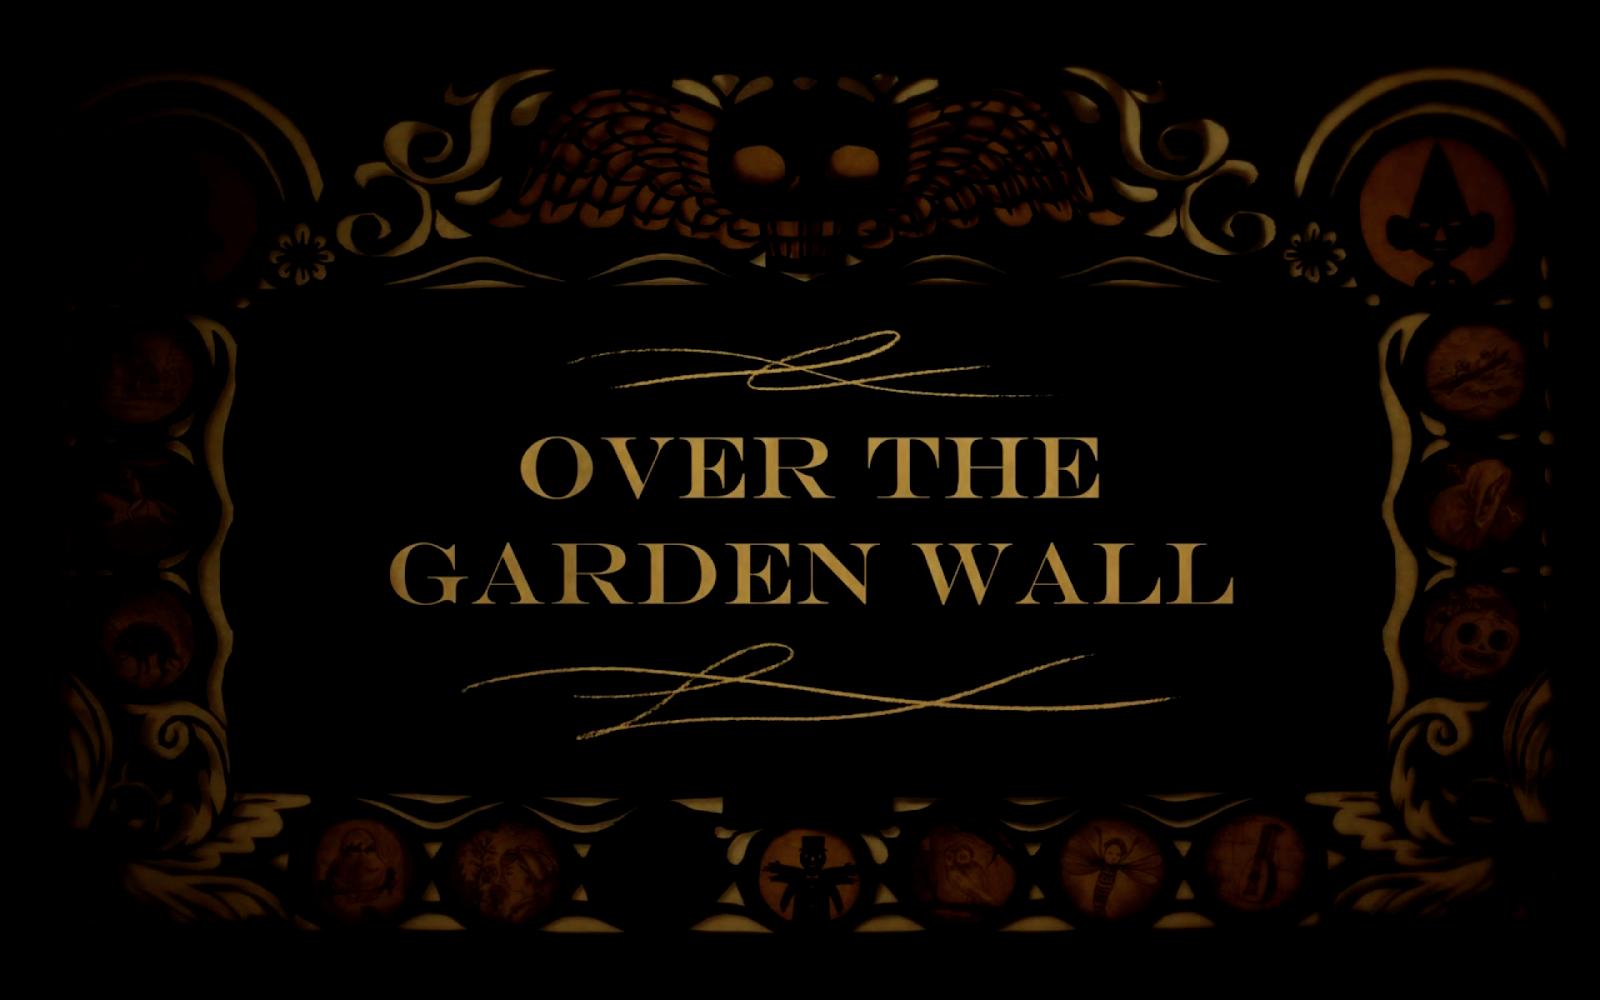 20 Over The Garden Wall Wallpapers Wallpaper Carax